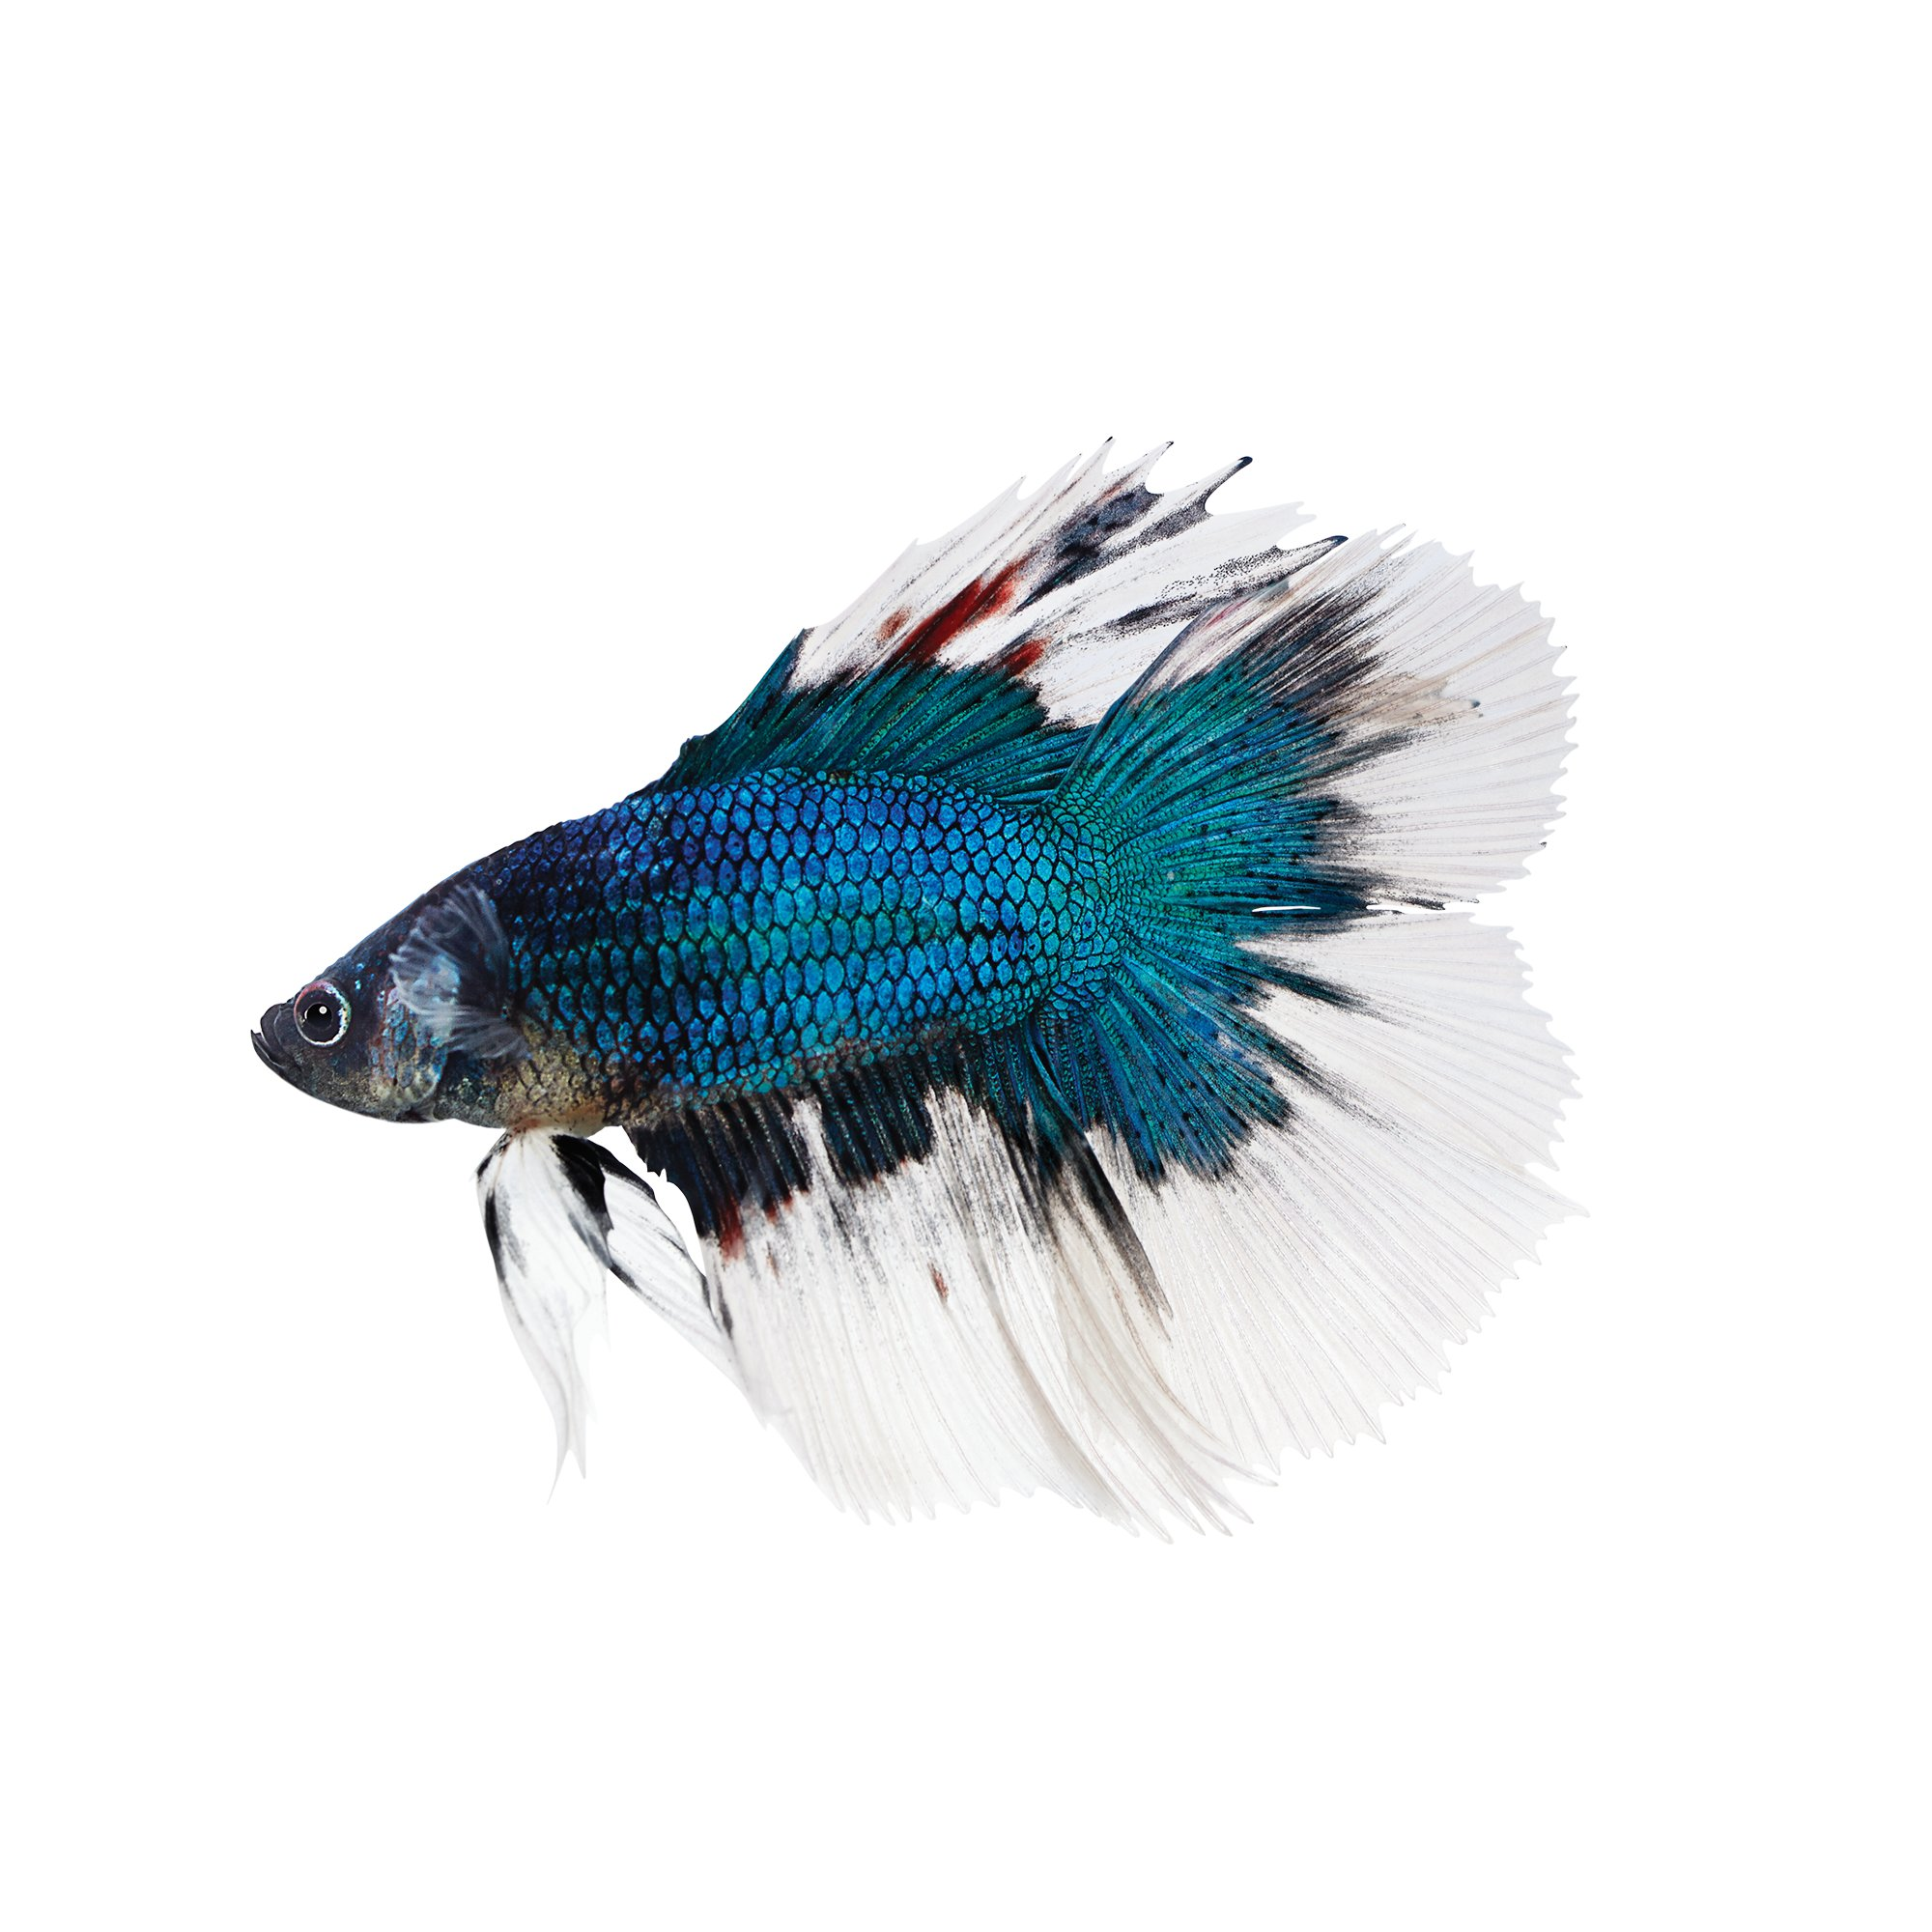 Butterfly betta betta splendens petco for Petco betta fish price